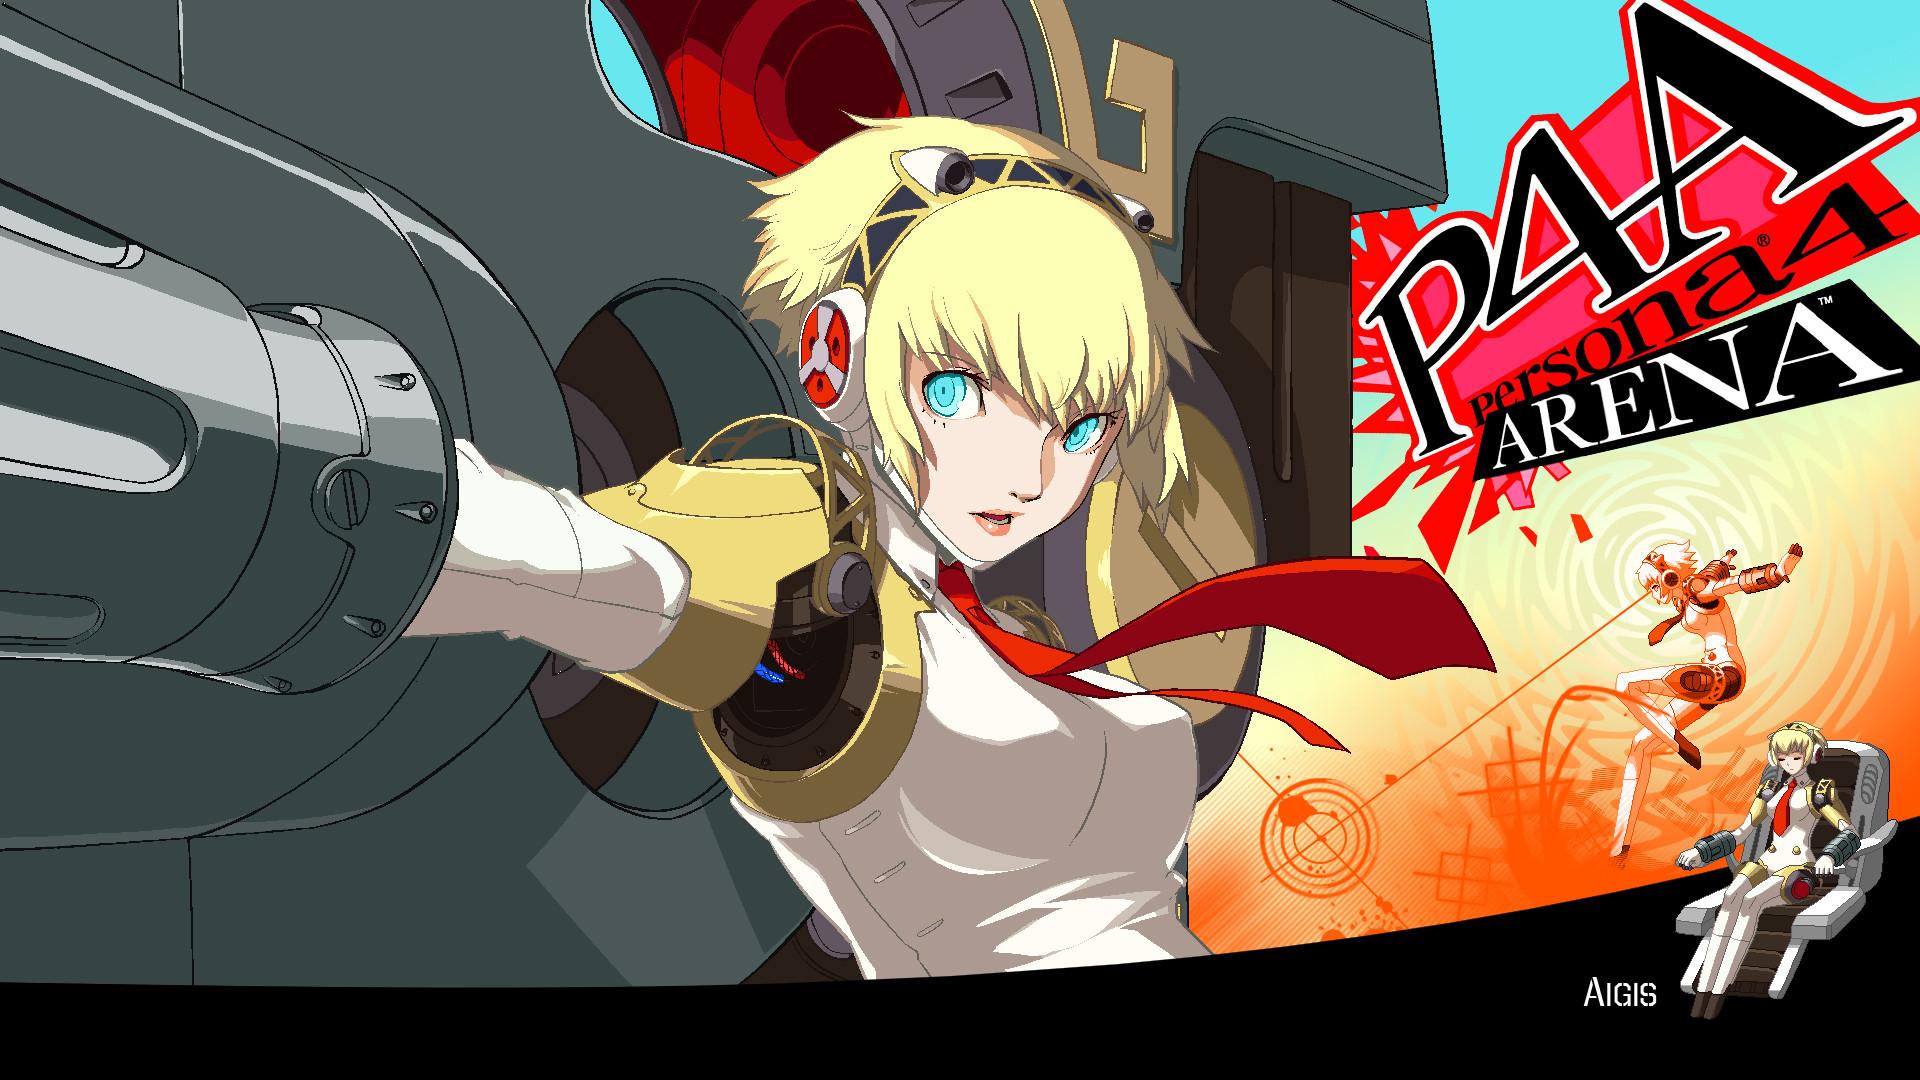 … Persona 4 Arena – Aigis 1080p Wallpaper by ZuperKim